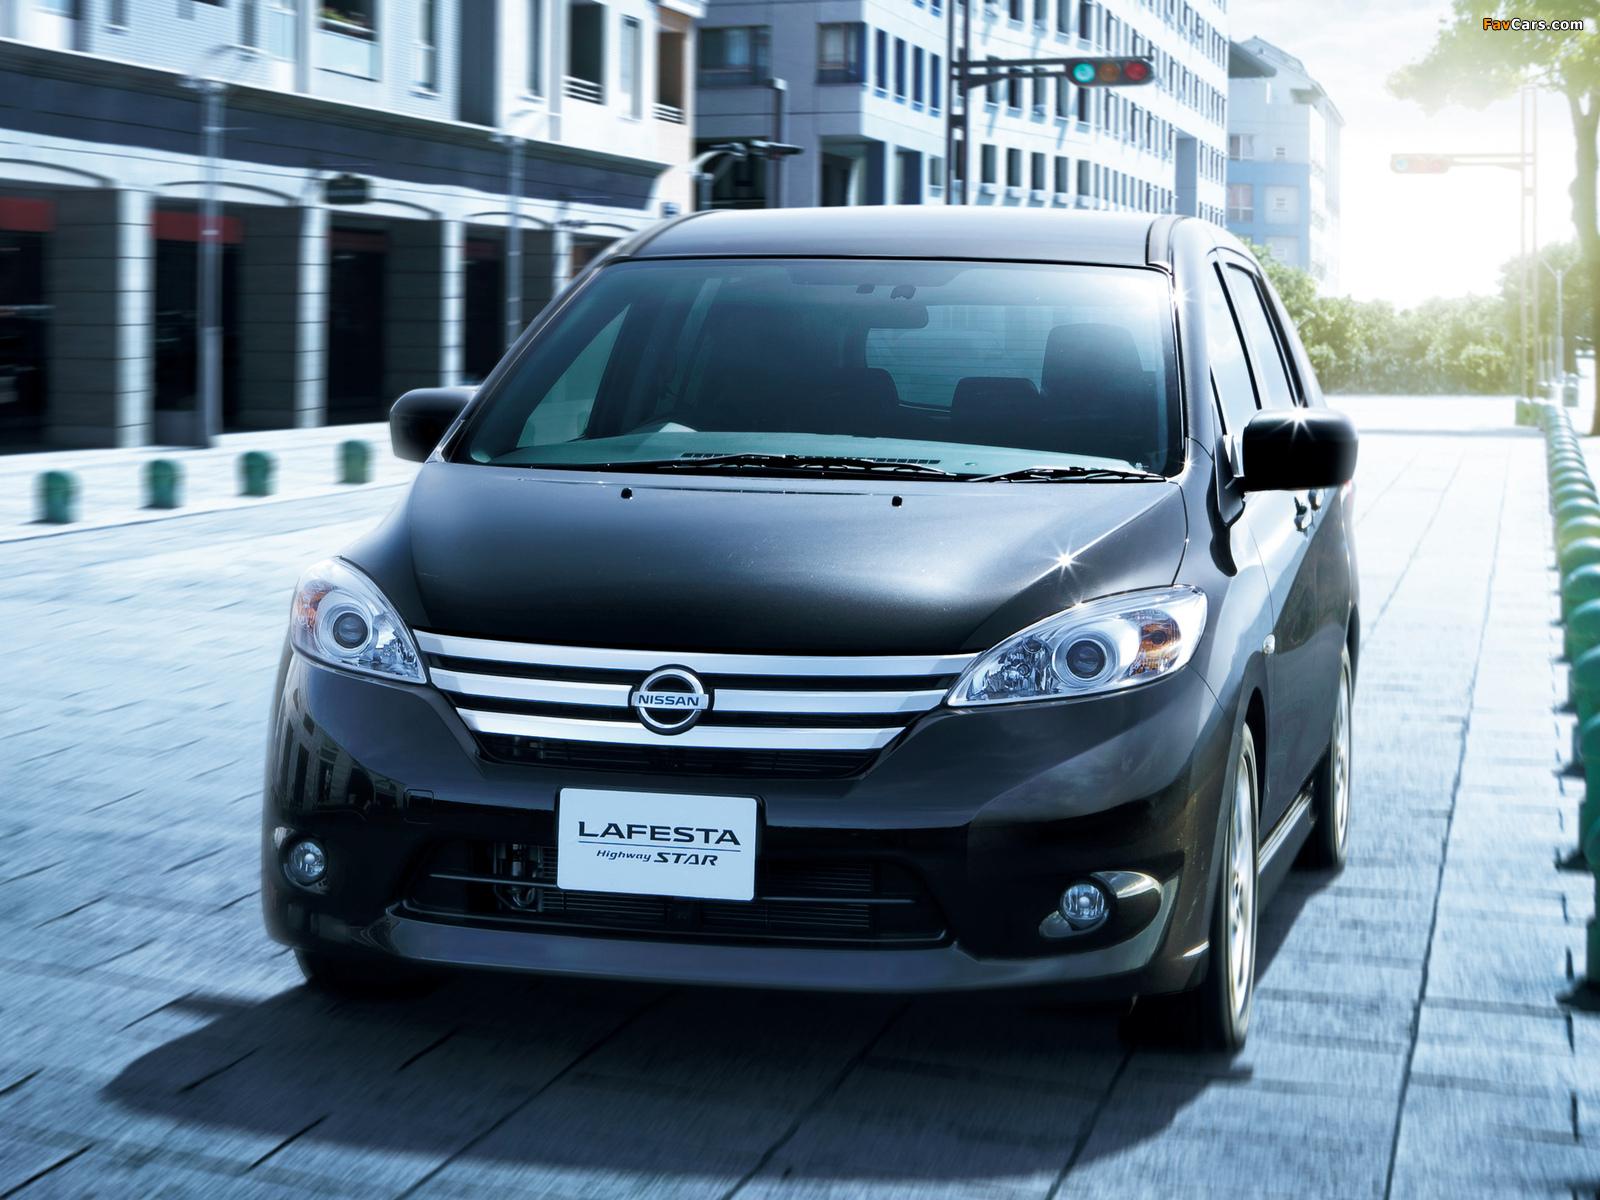 Images of Nissan Lafesta Highway Star (B35) 2011 (1600 x 1200)